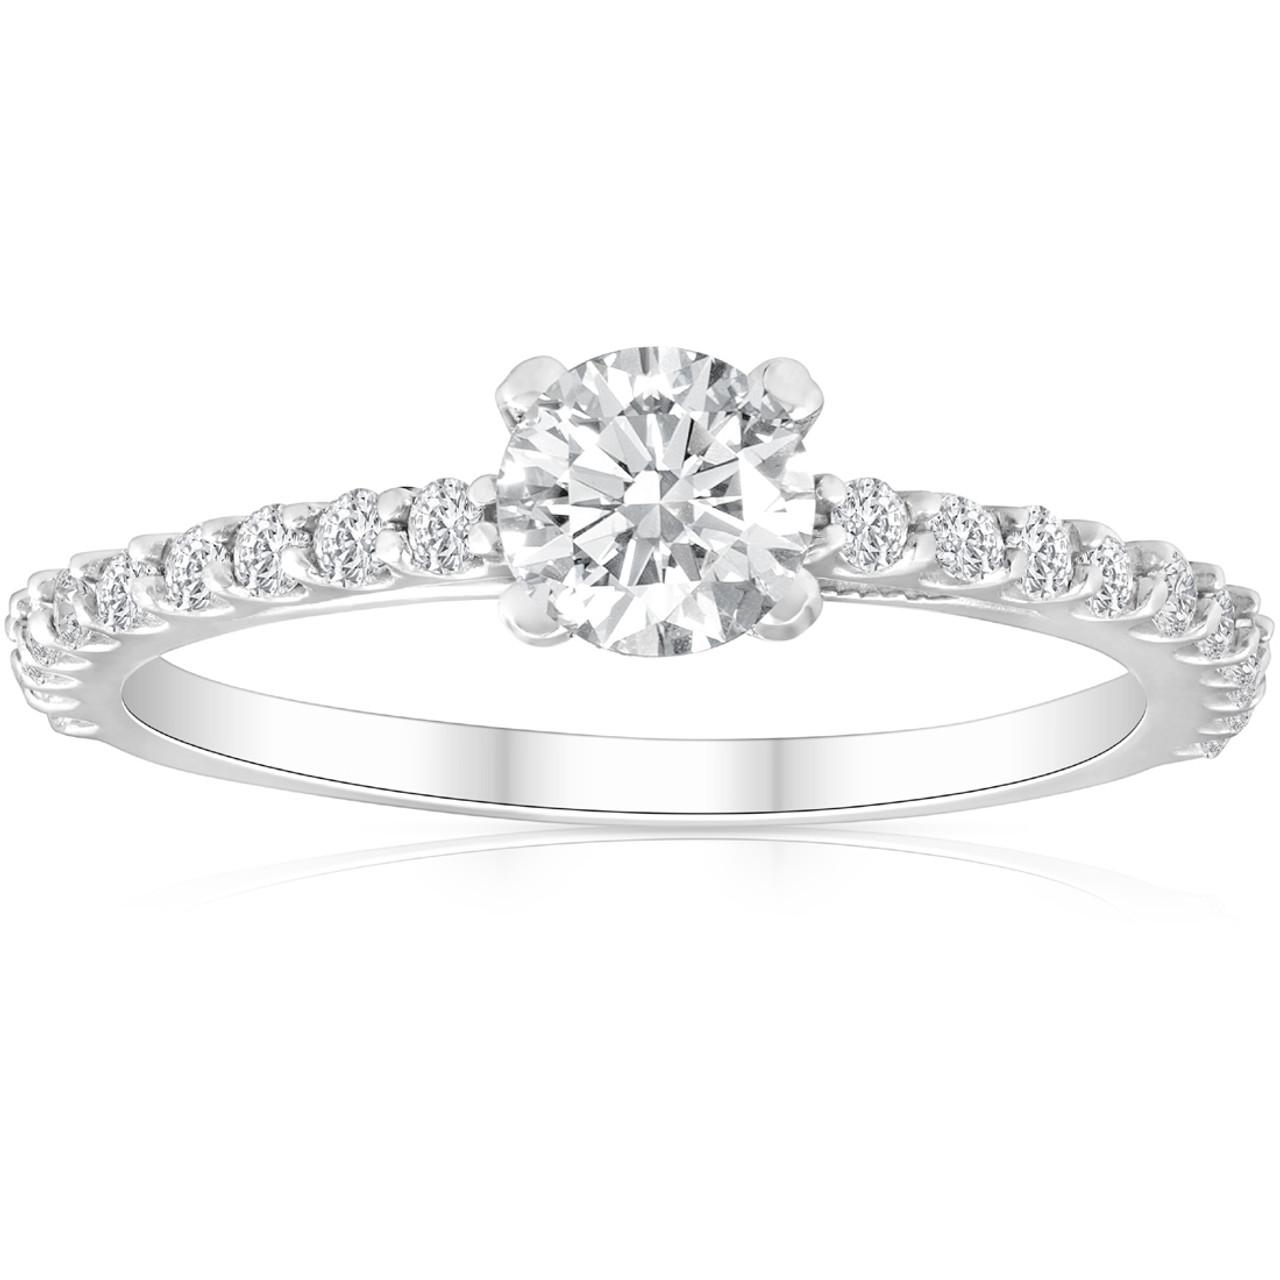 1 Ct Round Cut Diamond Engagement Ring Single Row 14k White Gold